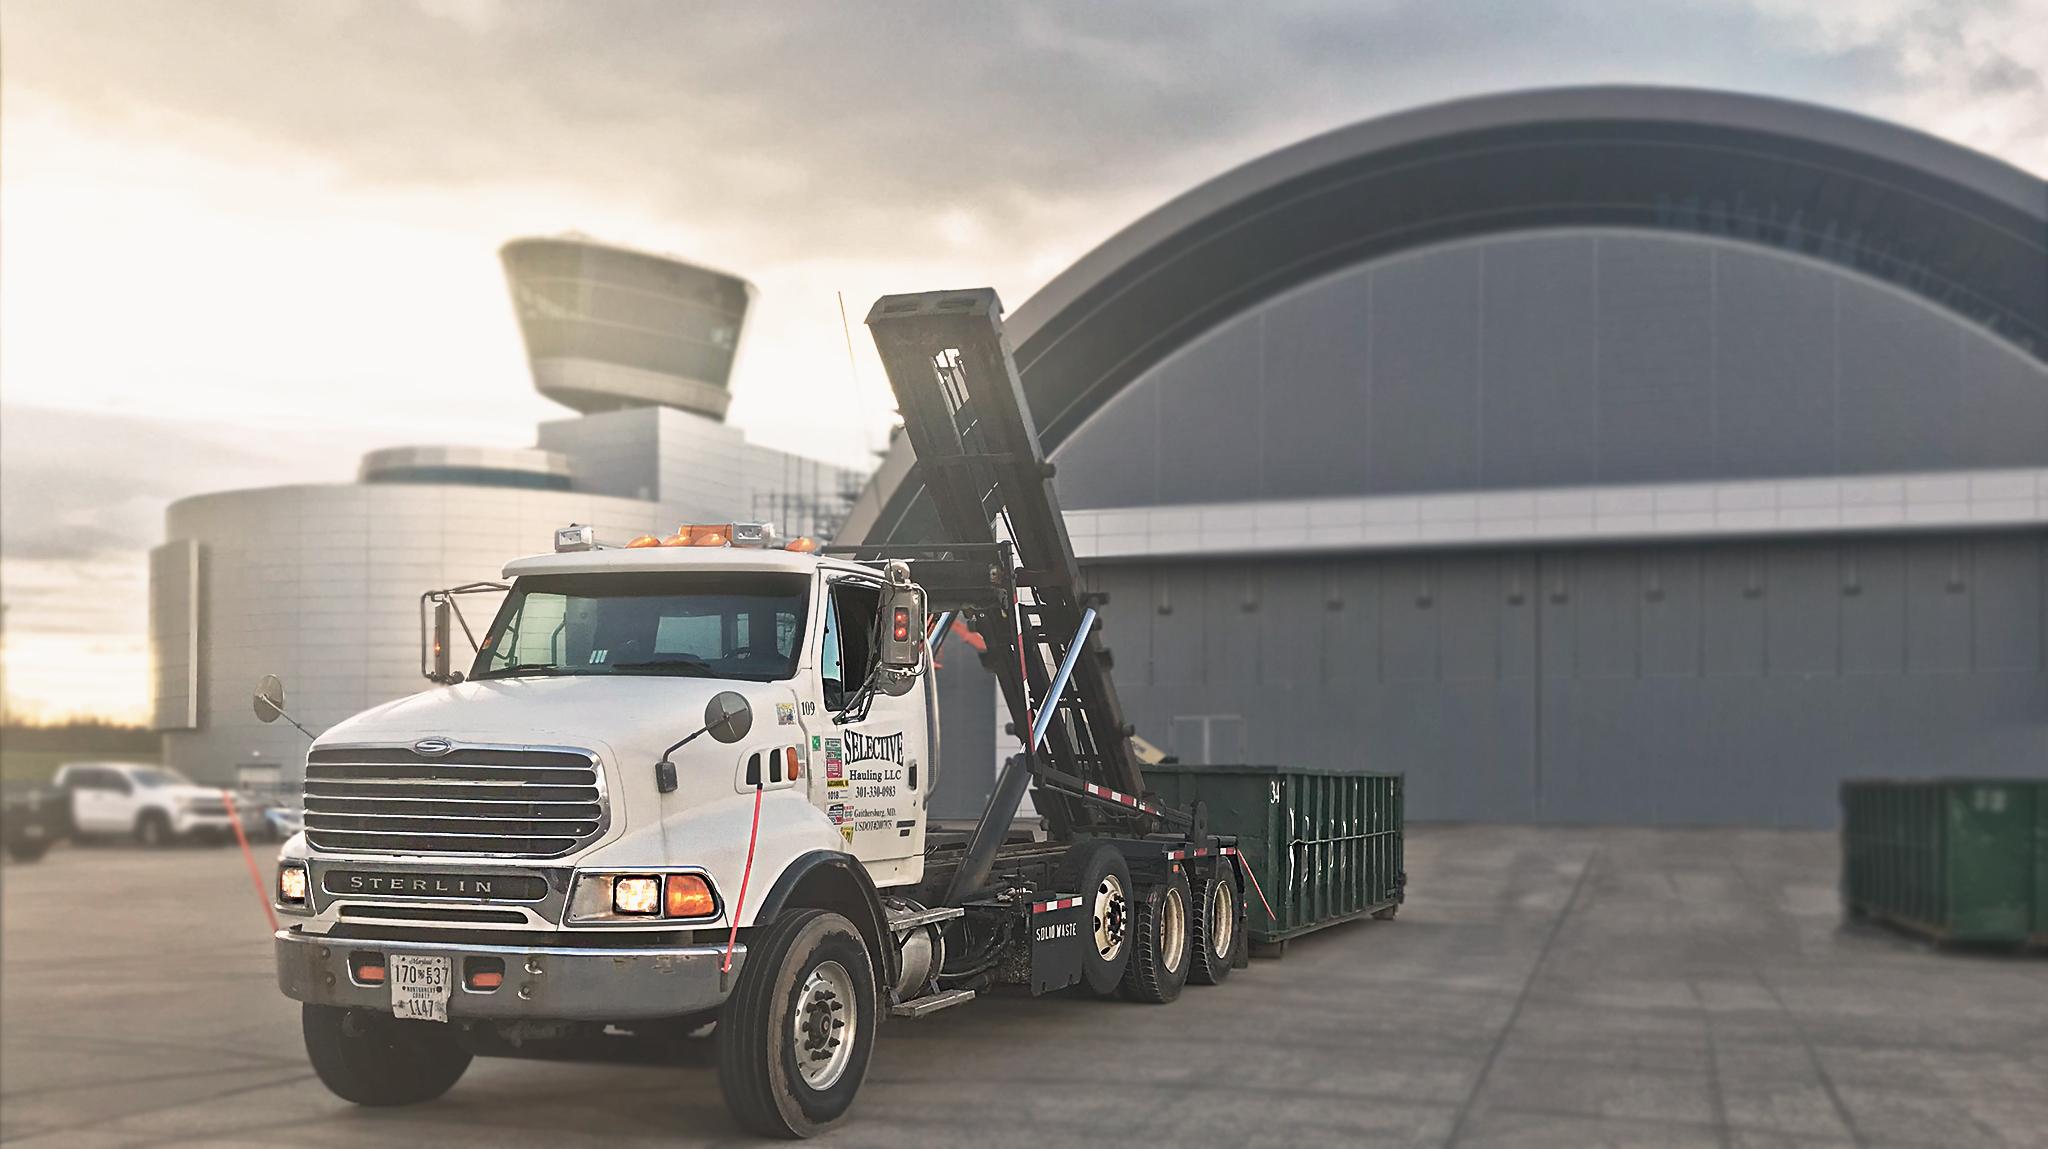 Dumpster rental Fairfax VA - Fairfax Dumpster Rental